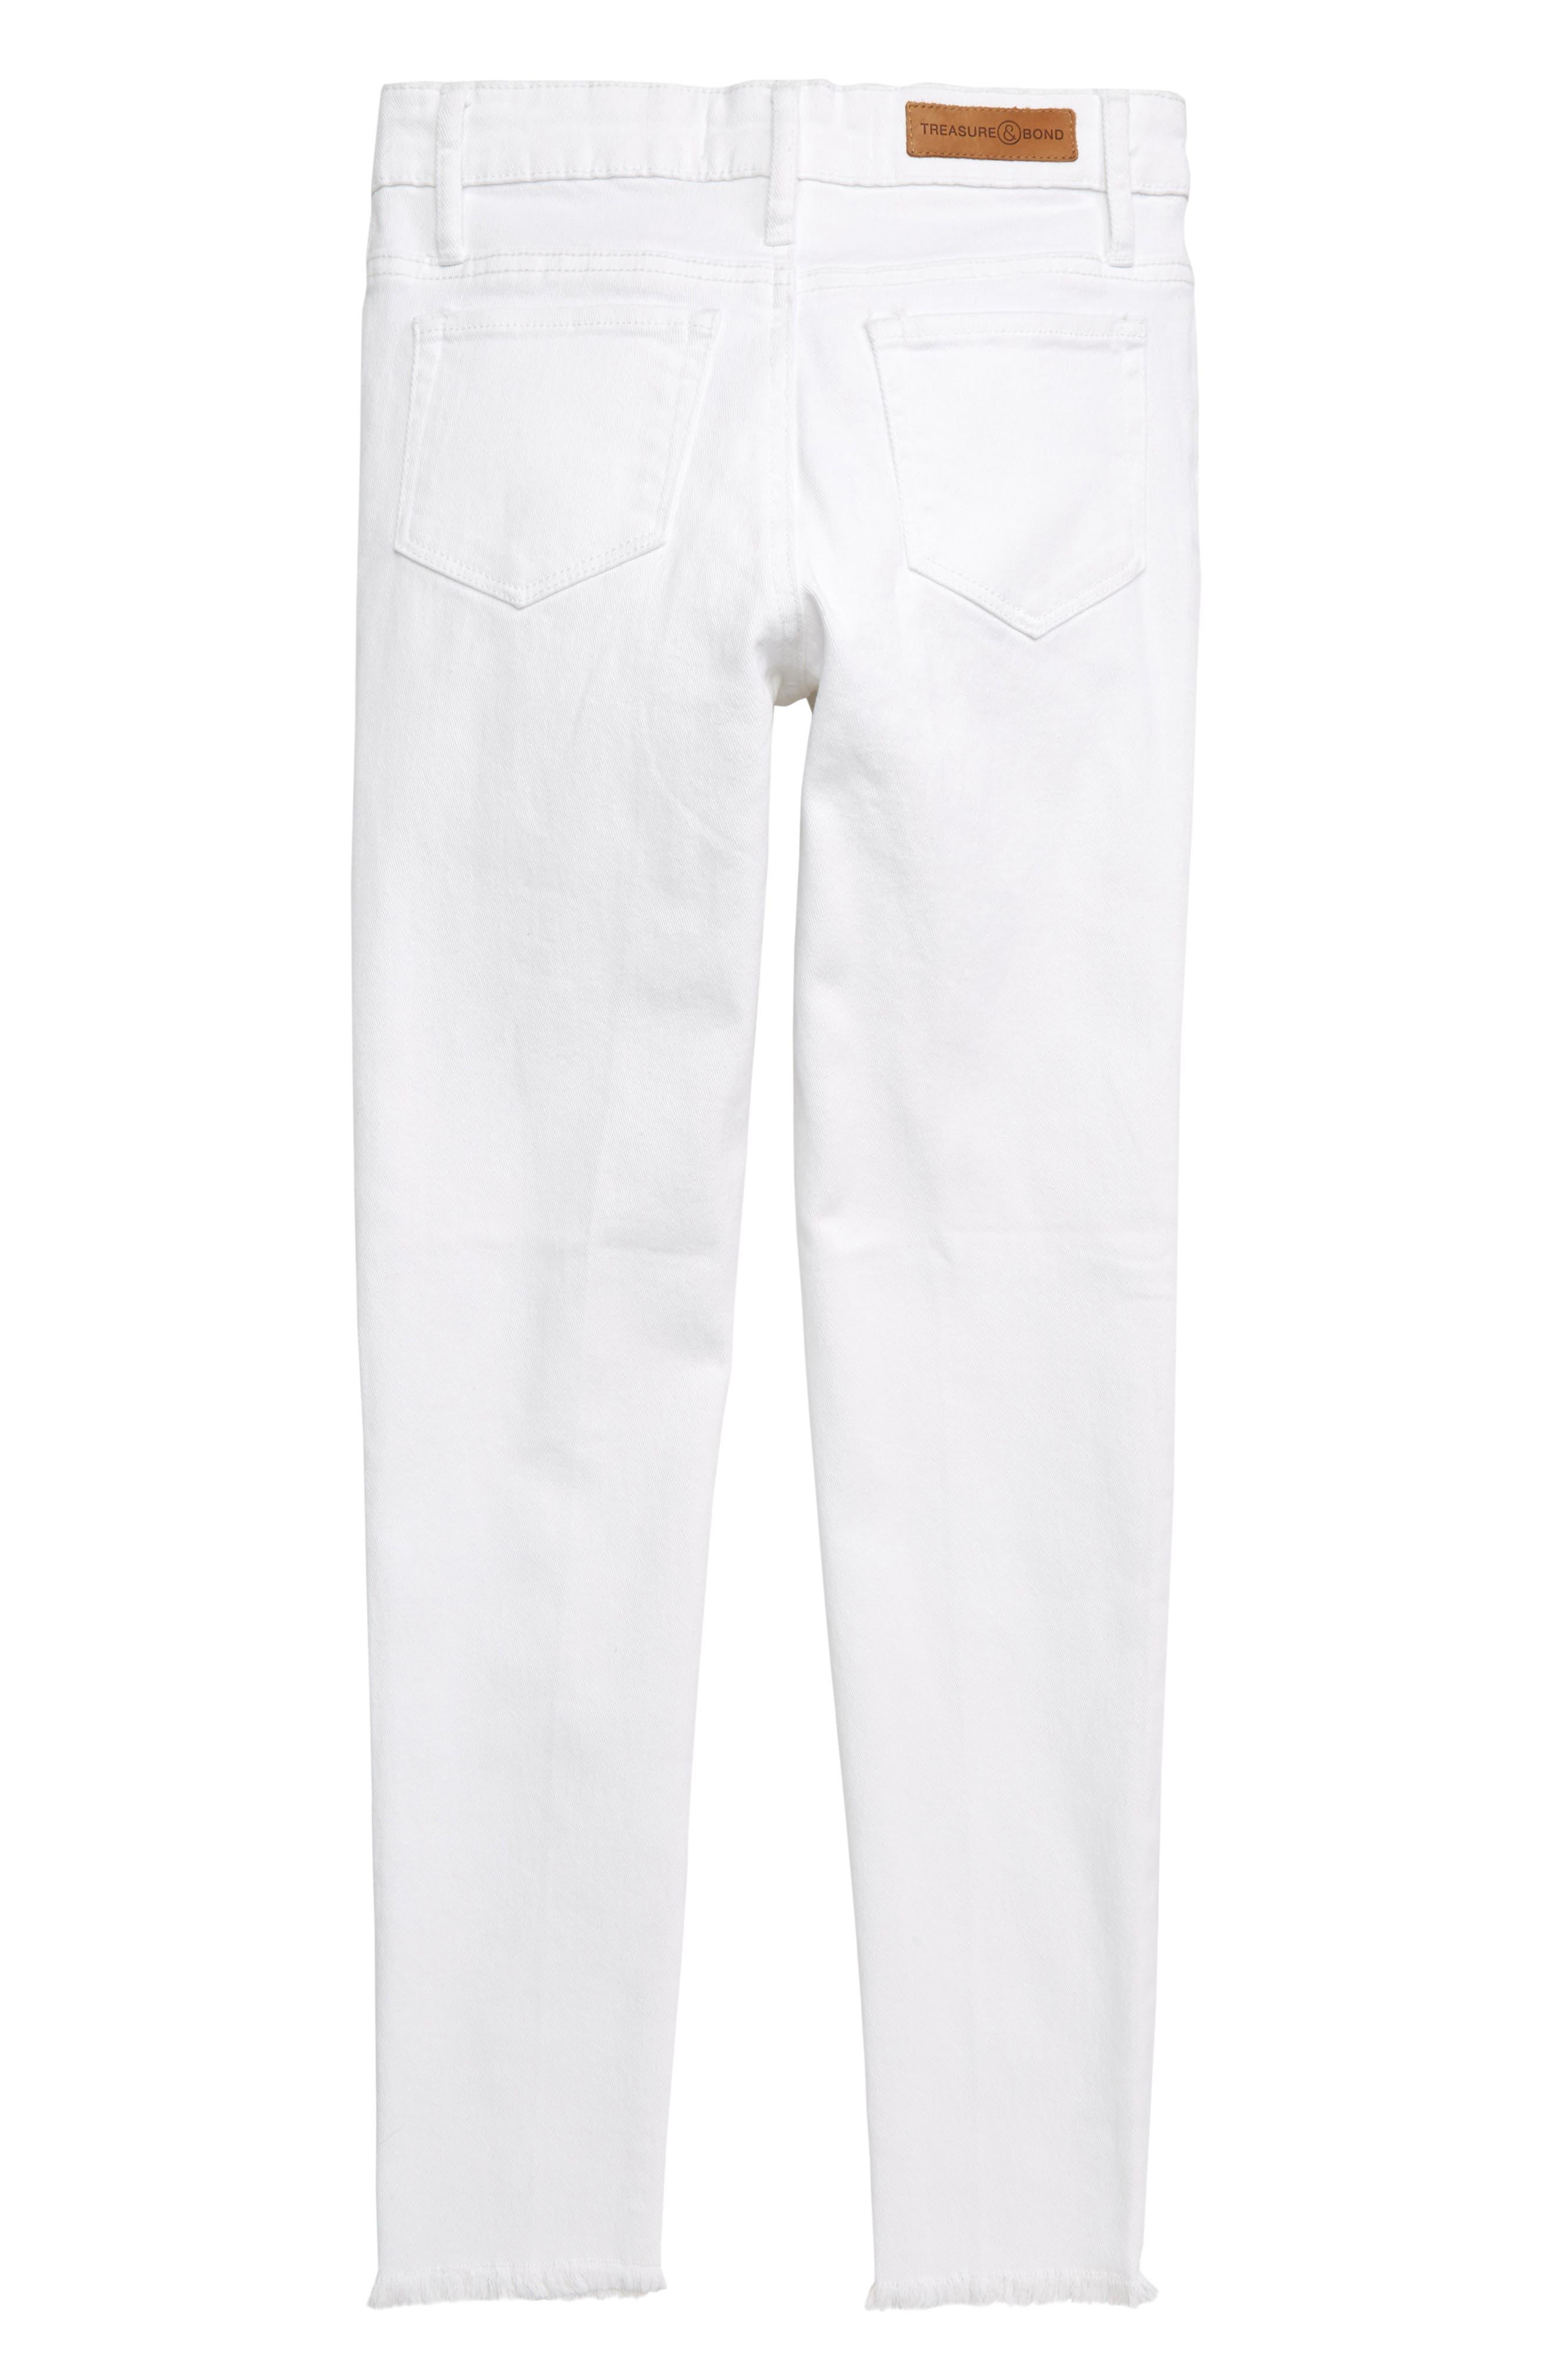 TREASURE & BOND, Distressed Skinny Jeans, Alternate thumbnail 2, color, WHITE